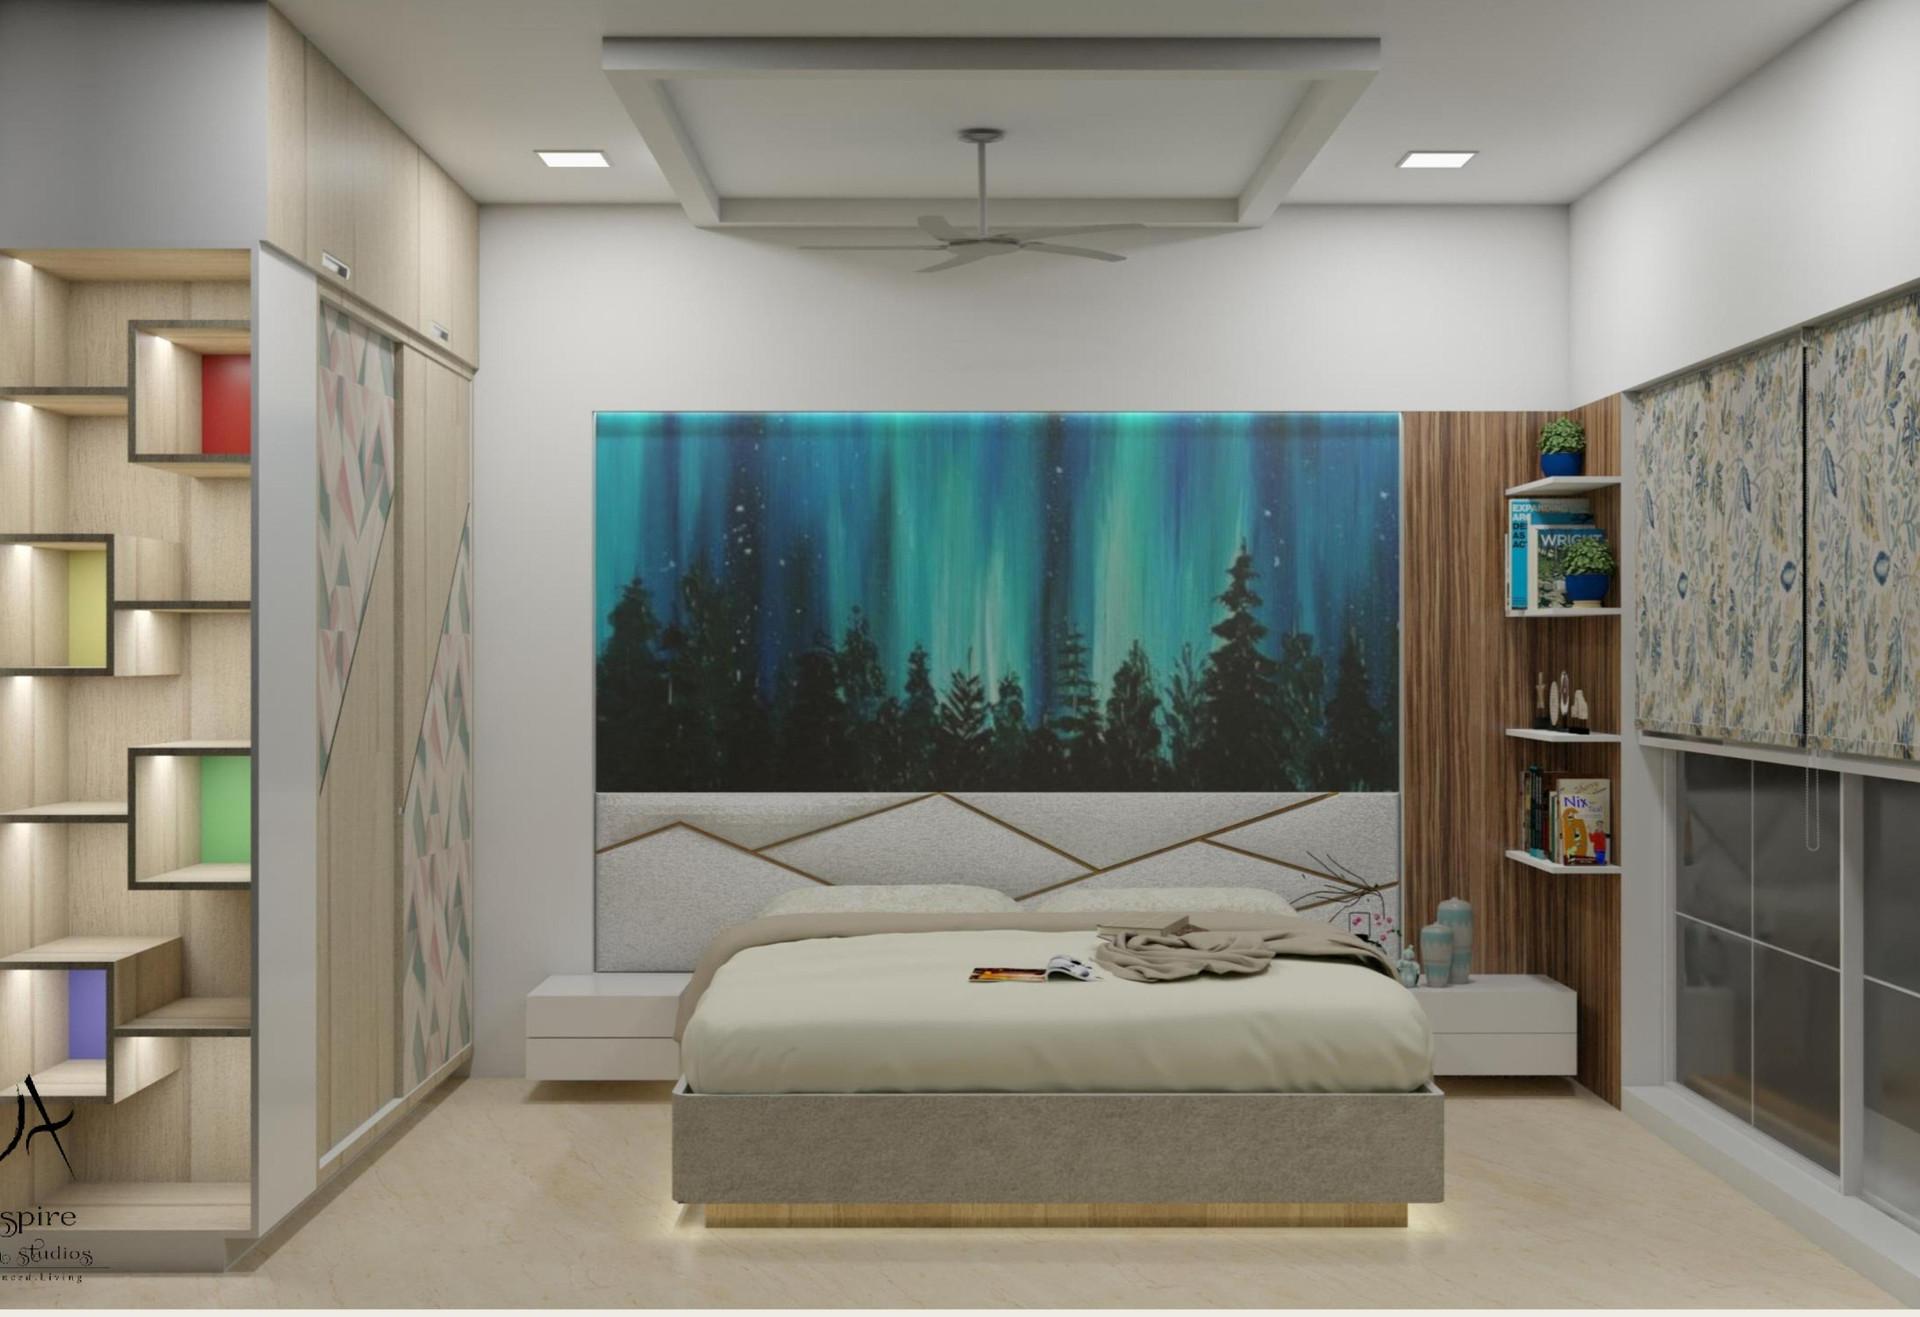 Transitional style interior 3bhk